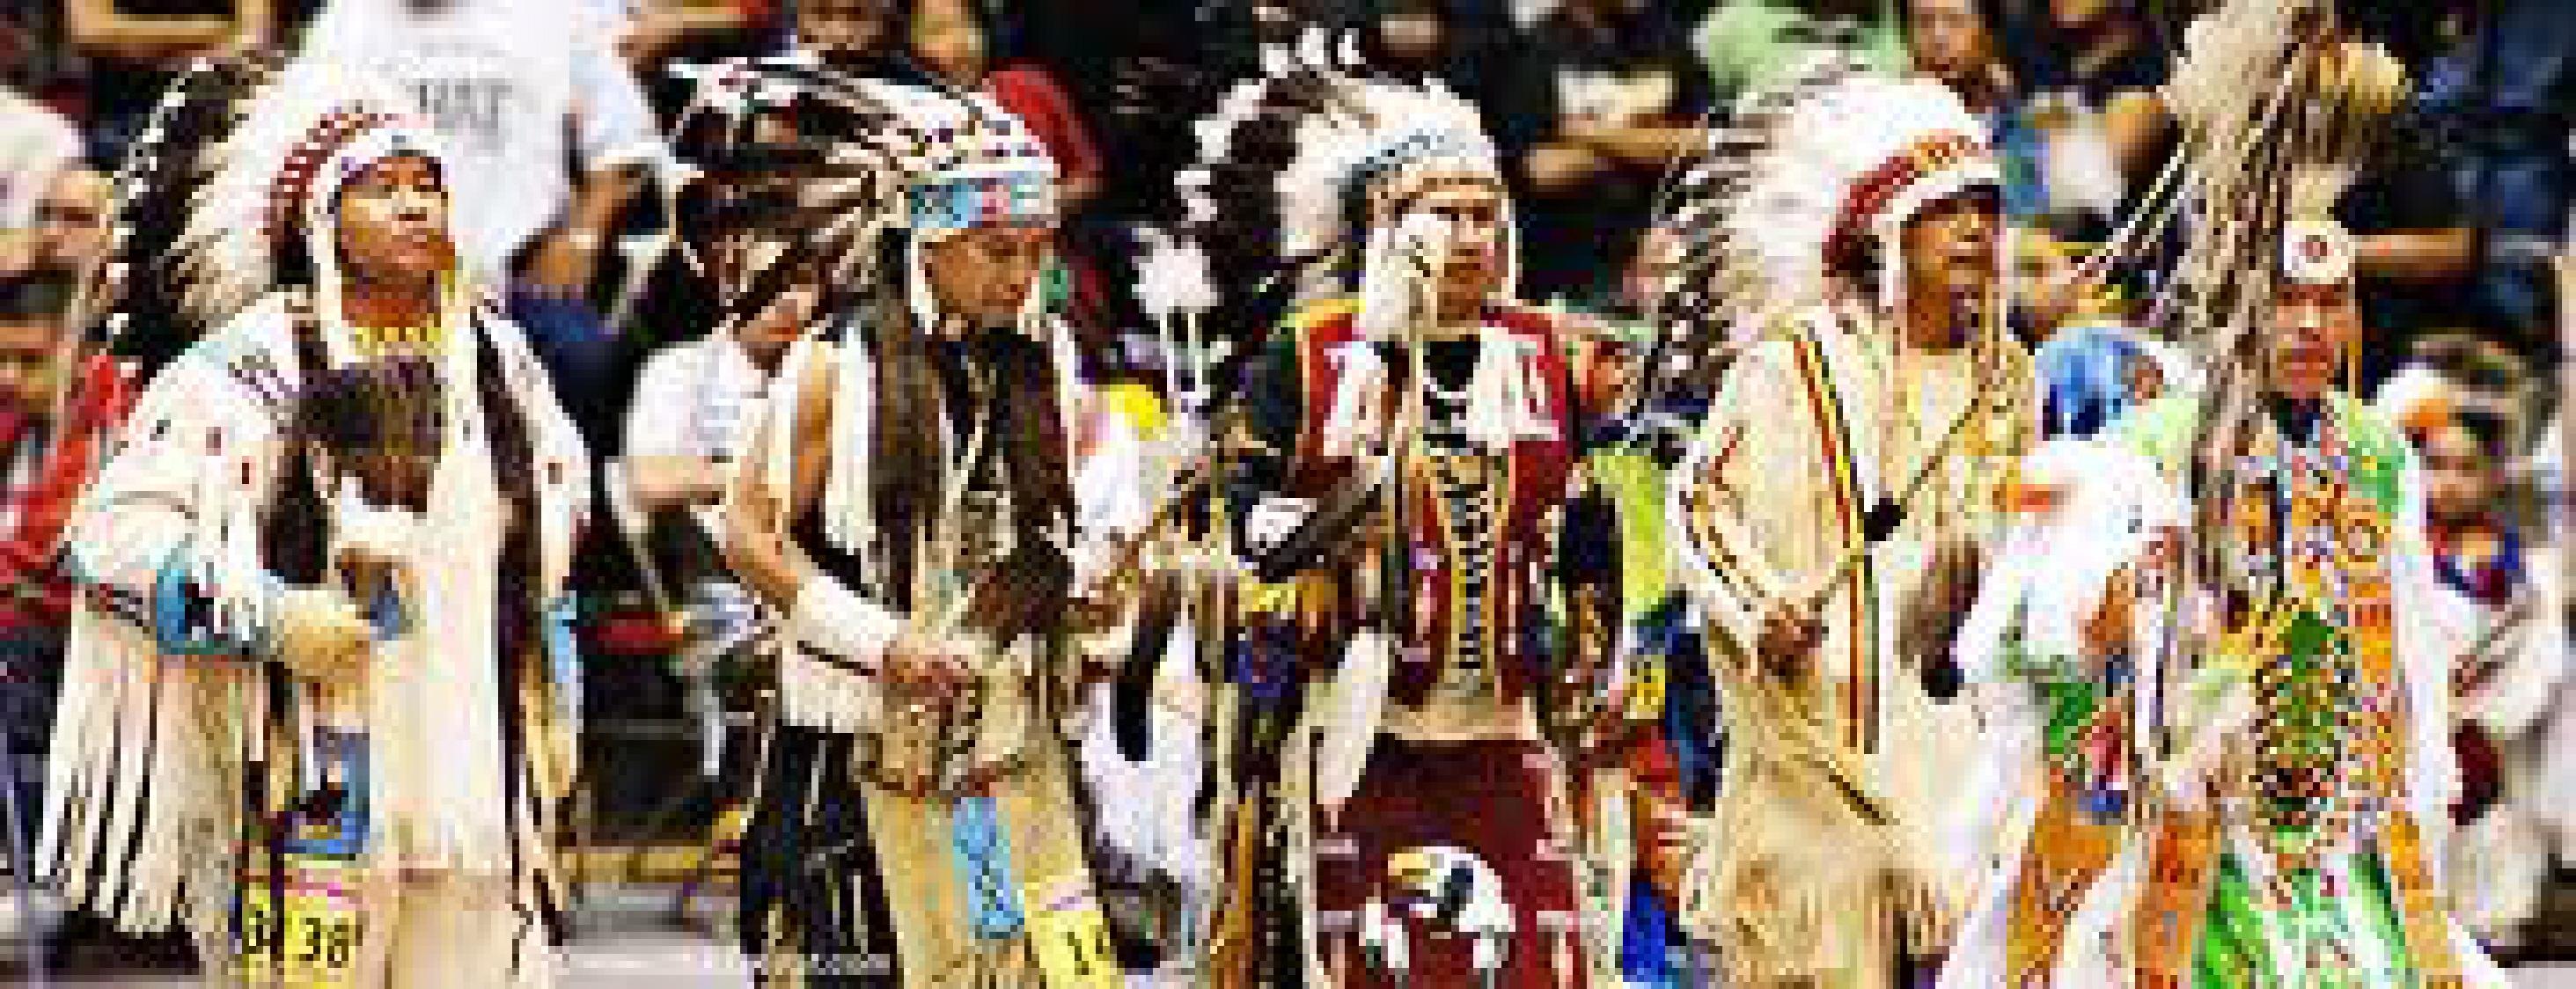 Native American History – Turtle Island: The Original Name for North America